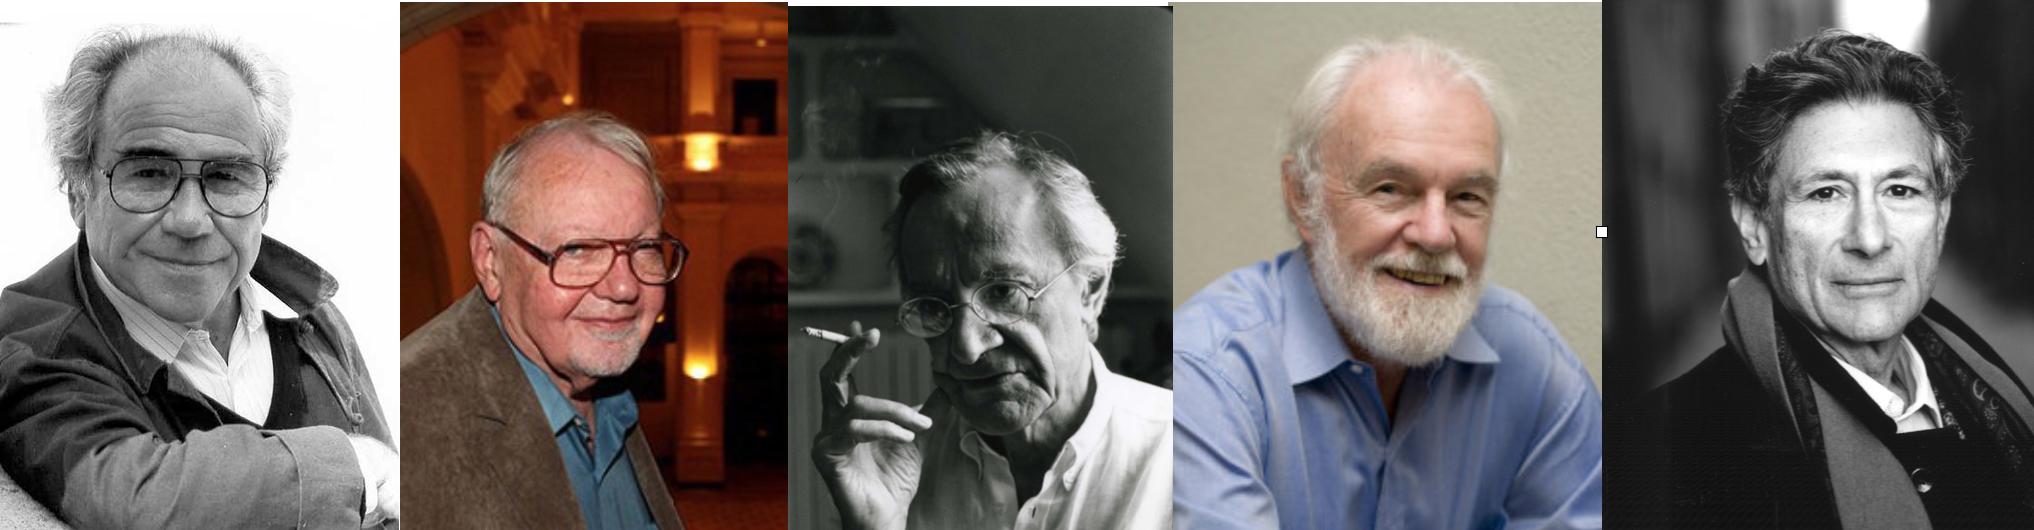 Baudrillard, James, Lyotard, Harvey y Said.